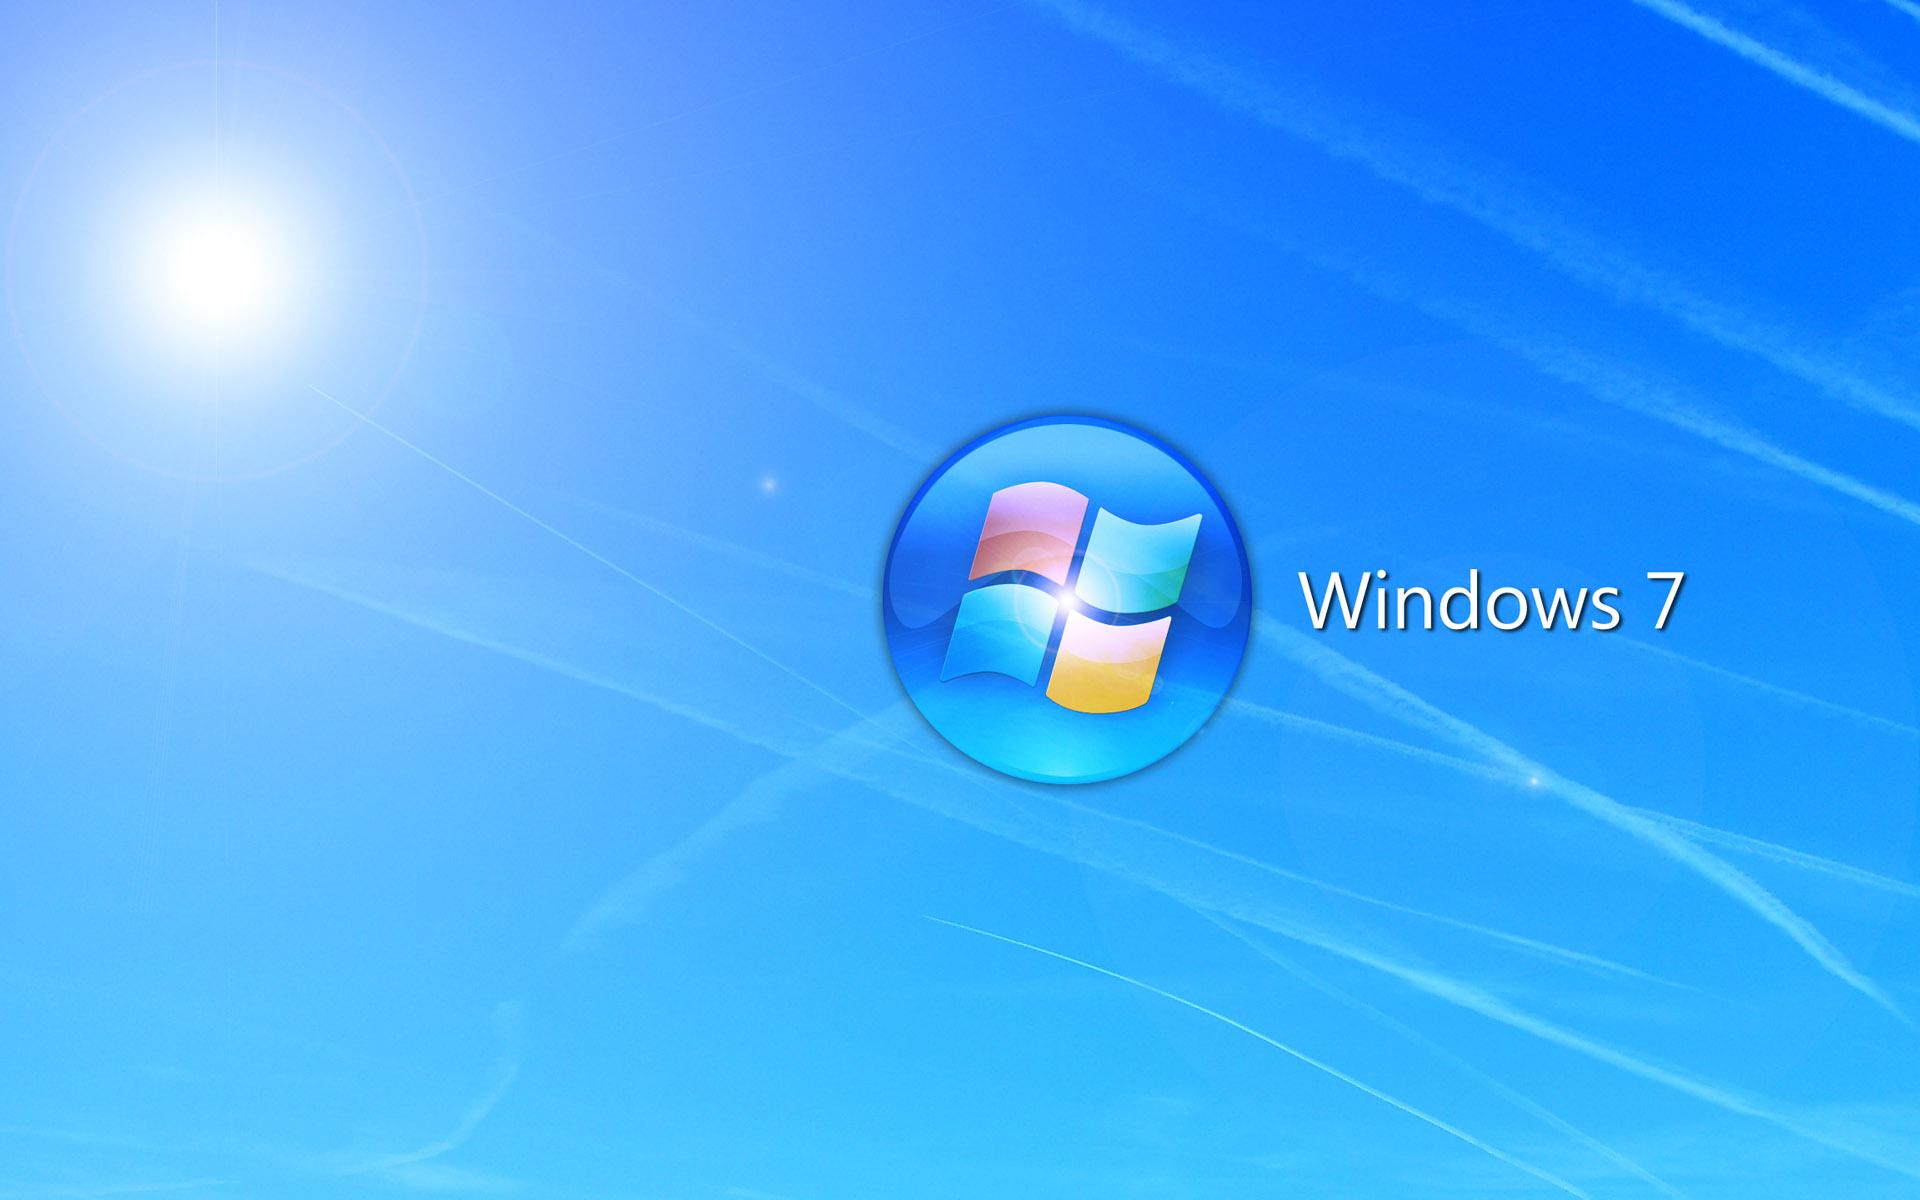 windows wallpaper supersonic cover wallpapers desktop